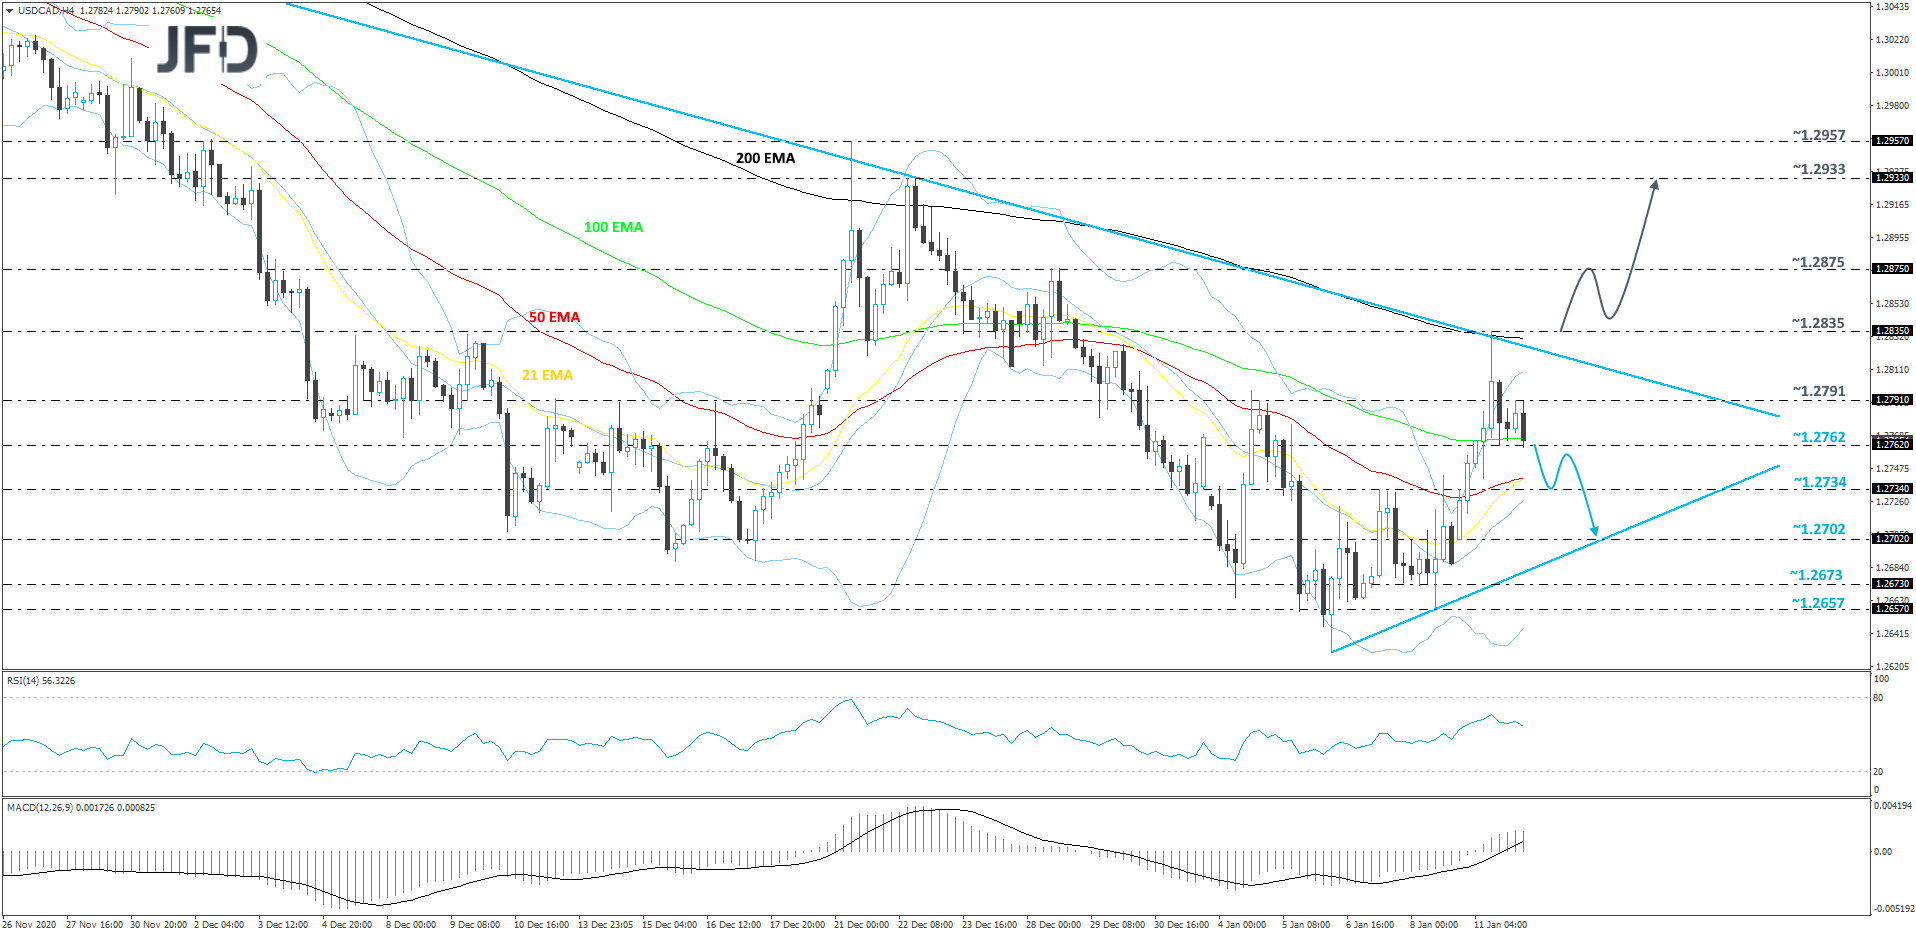 USD/CAD 4-hour chart technical analysis